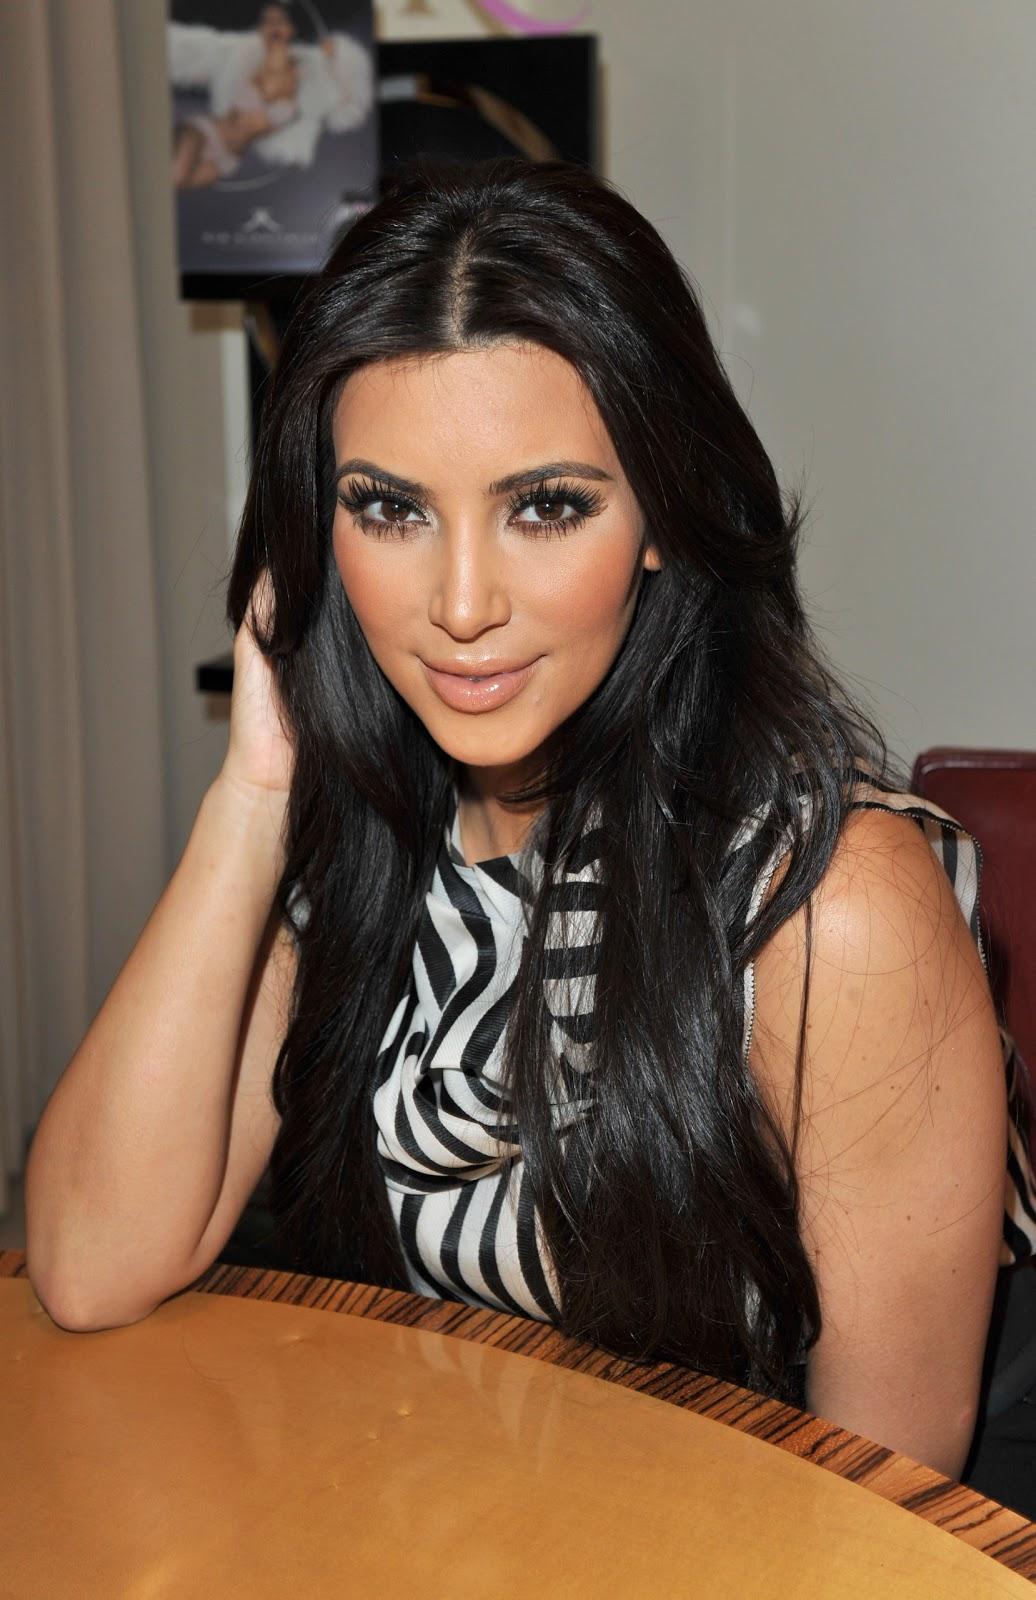 http://1.bp.blogspot.com/-npf80BCMrUg/Th--e5-uigI/AAAAAAAAA90/SaYLSlfhDXk/s1600/Kim+kardashian+hot+photo+shoot1.jpg